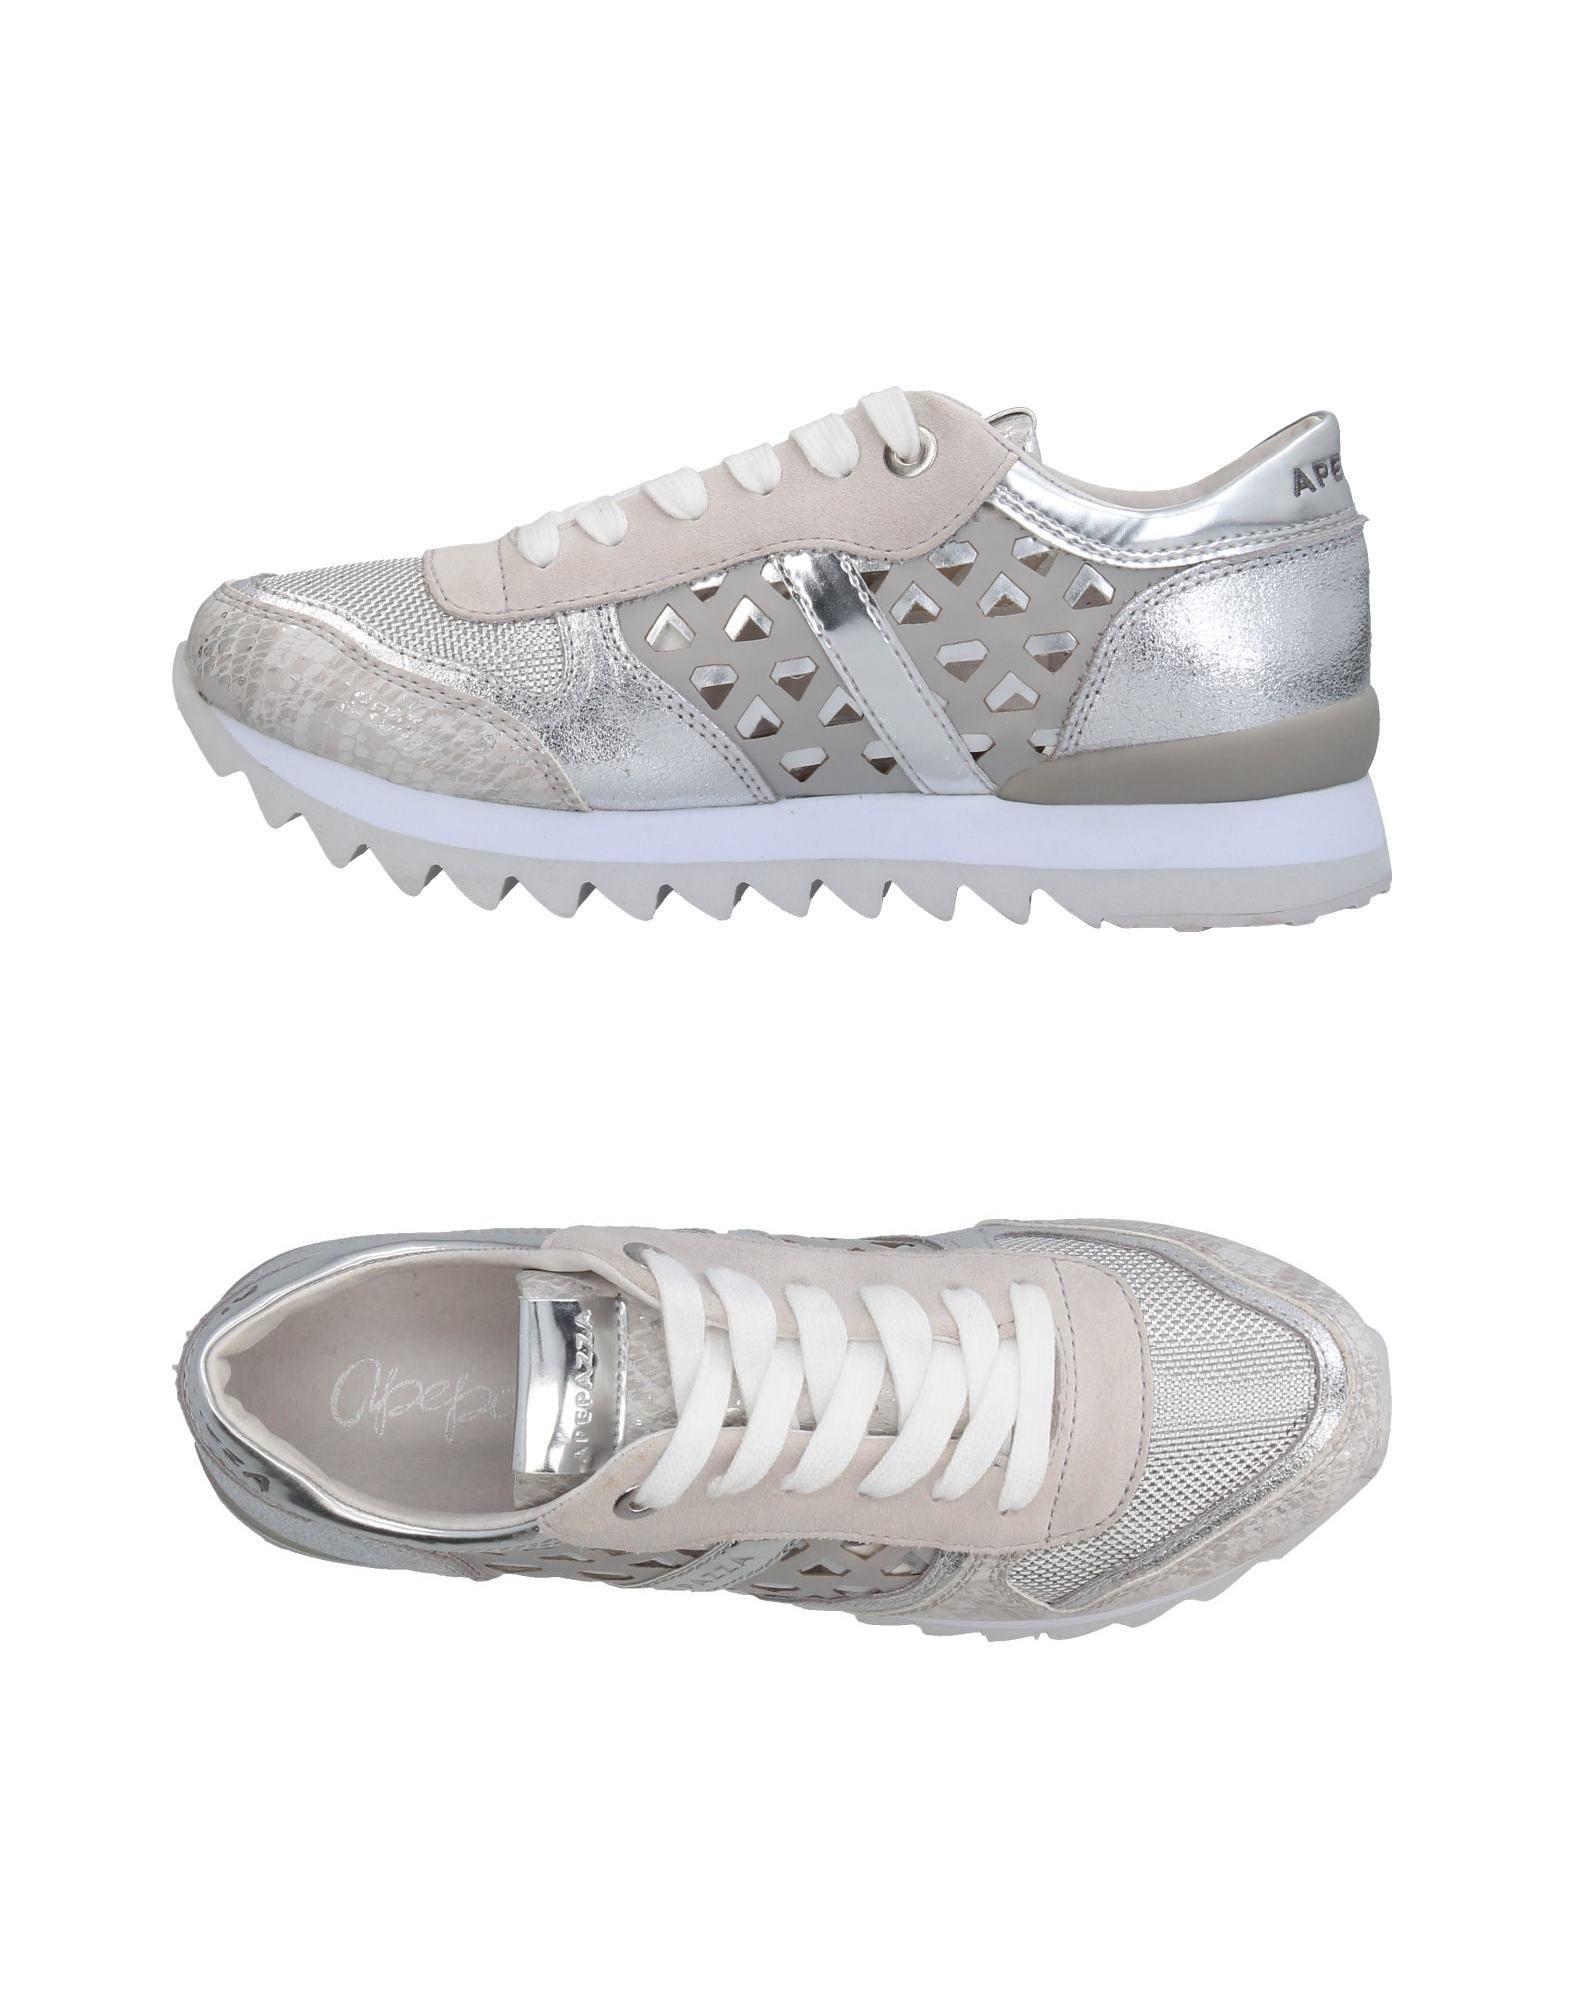 Apepazza Sneakers United - Women Apepazza Sneakers online on  United Sneakers Kingdom - 11392505CB b3be1f